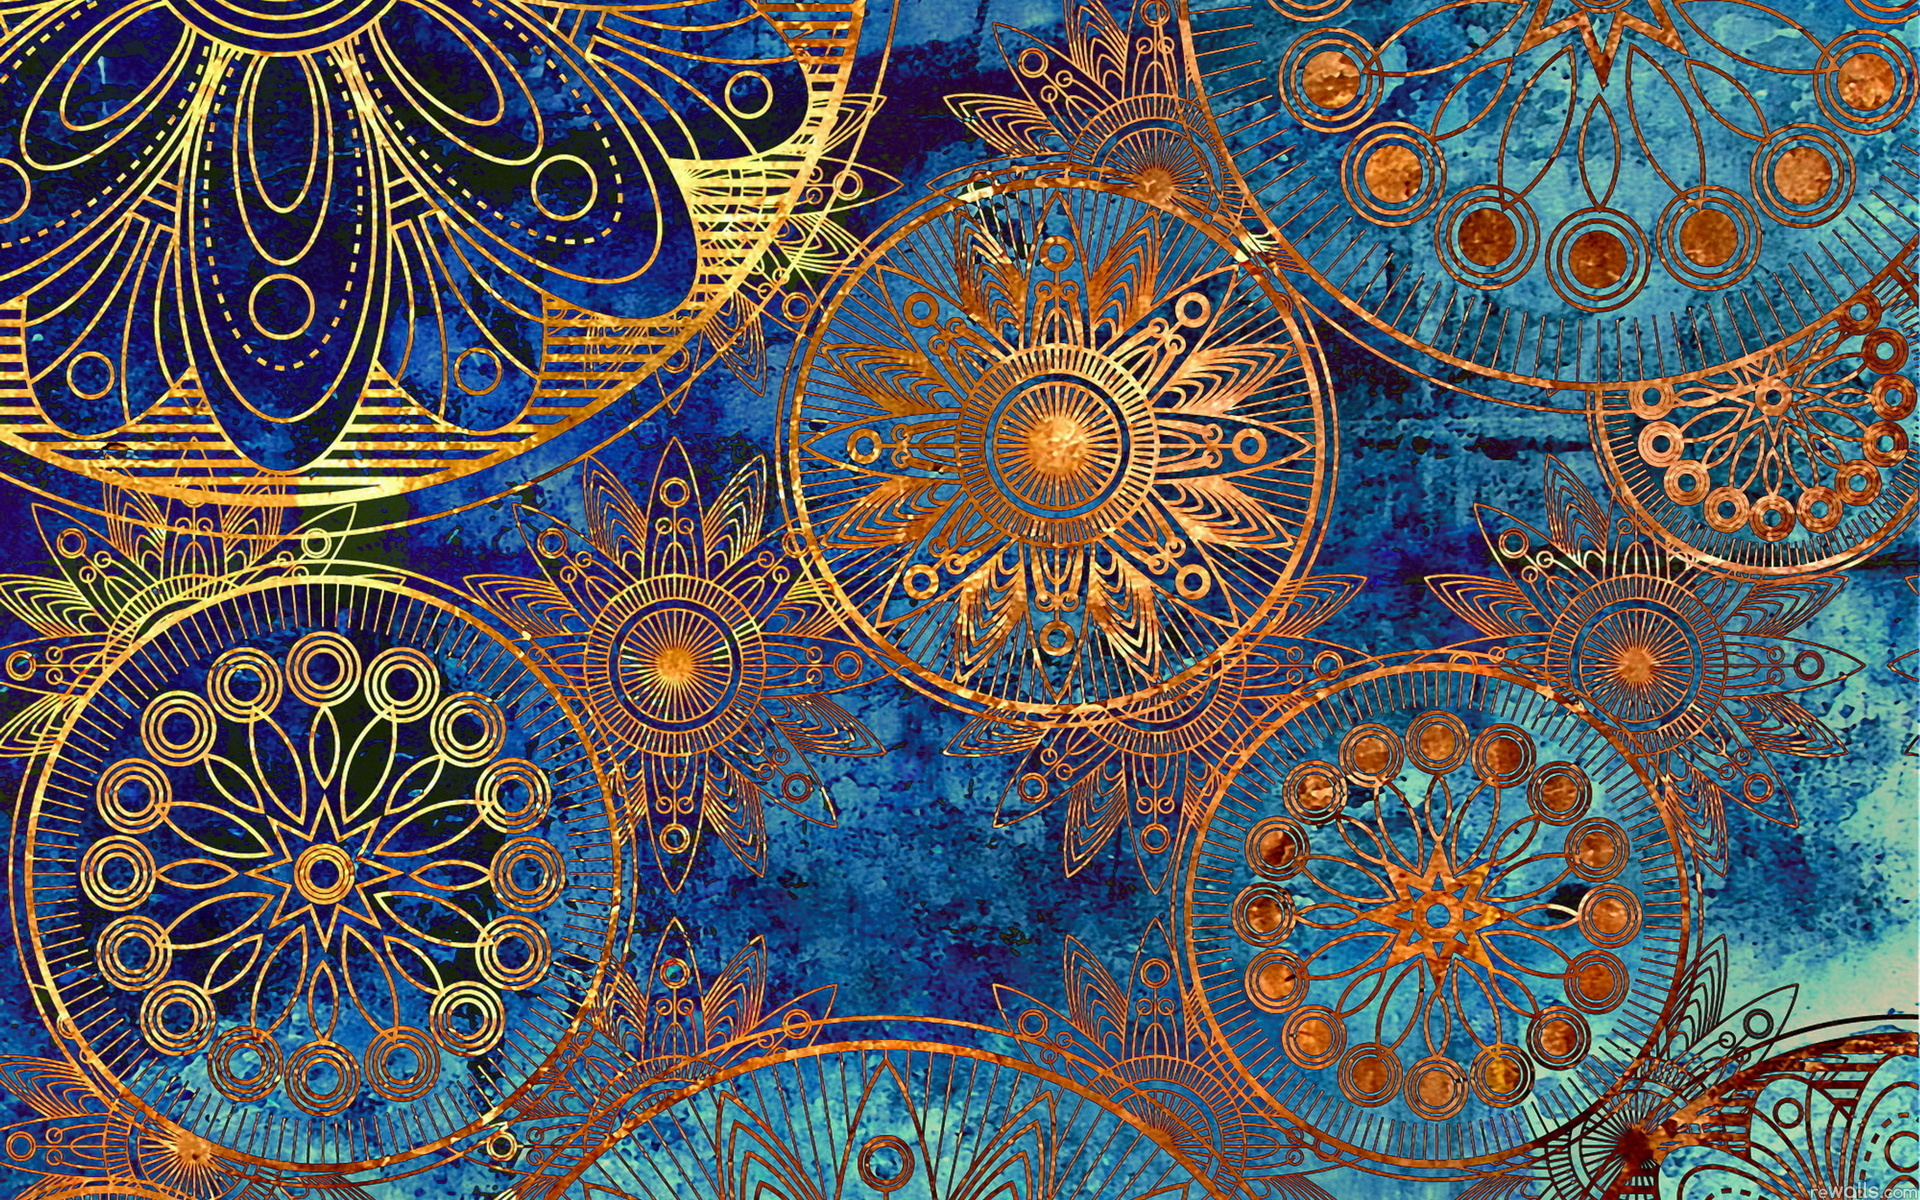 wallpapers background patterns wallpaper originals vintage original 1920x1200